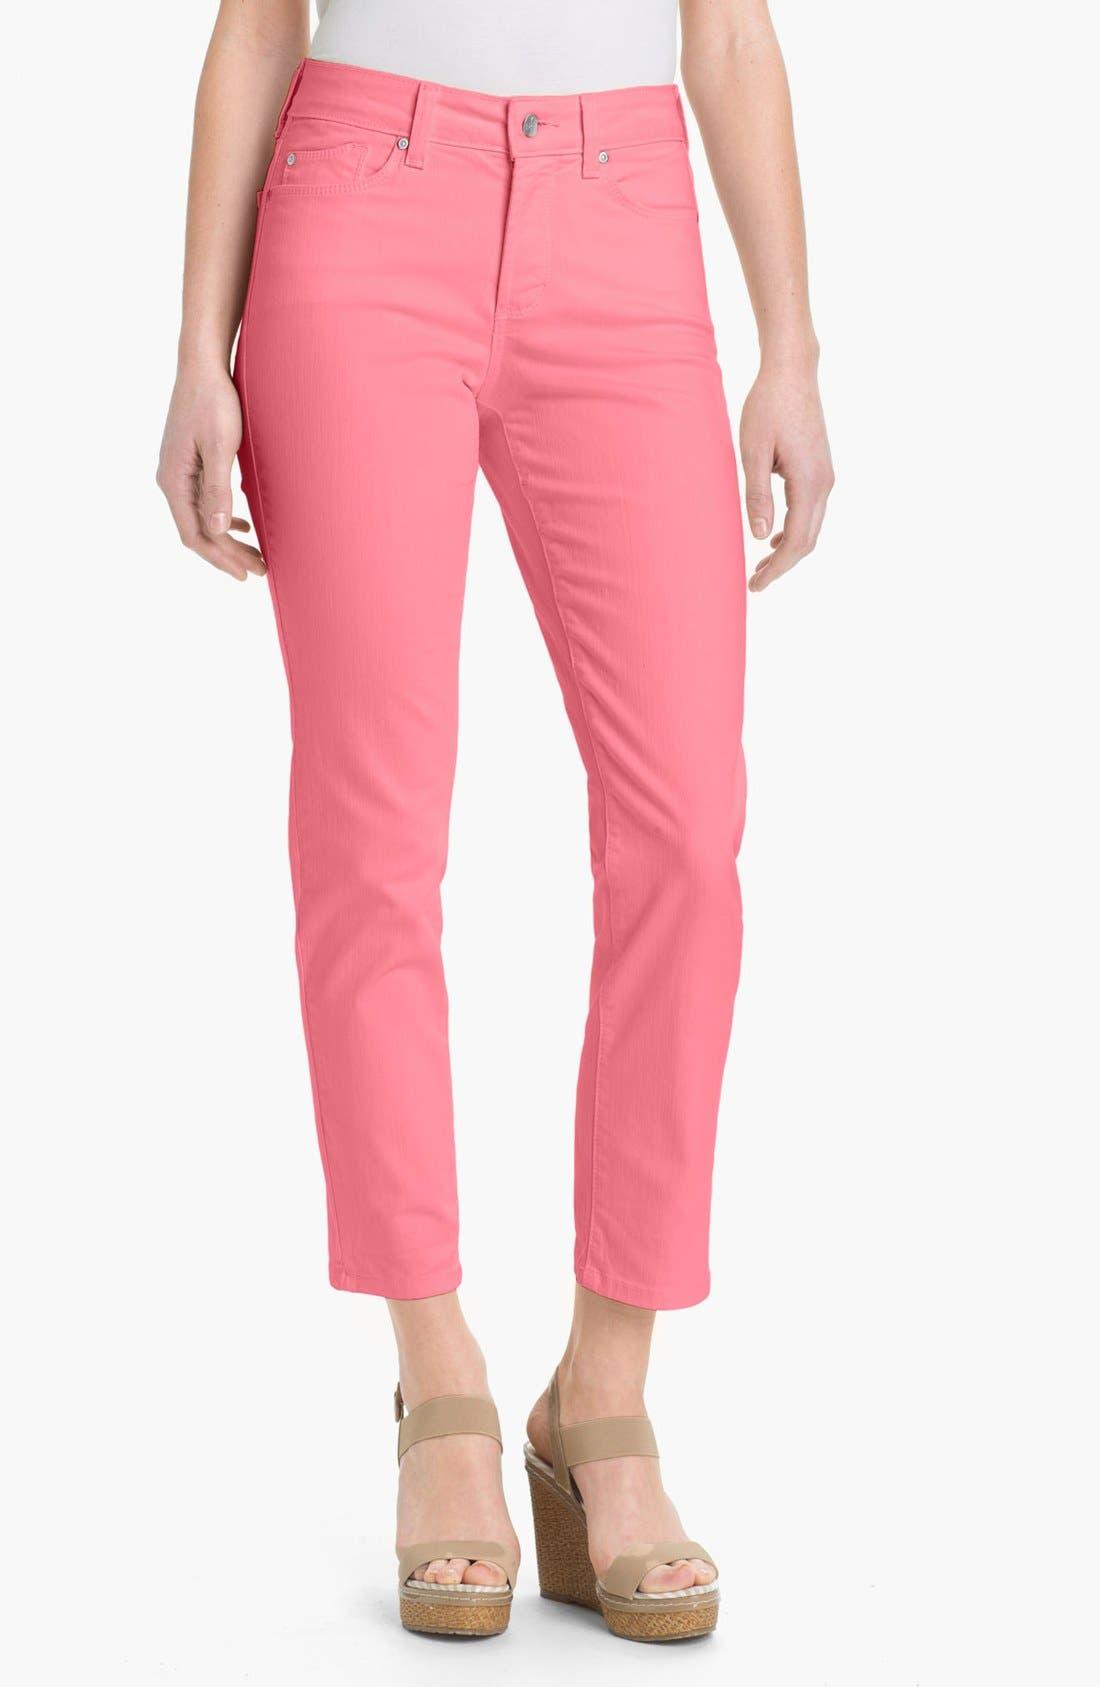 Alternate Image 1 Selected - NYDJ 'Alisha' Skinny Stretch Ankle Jeans (Petite)